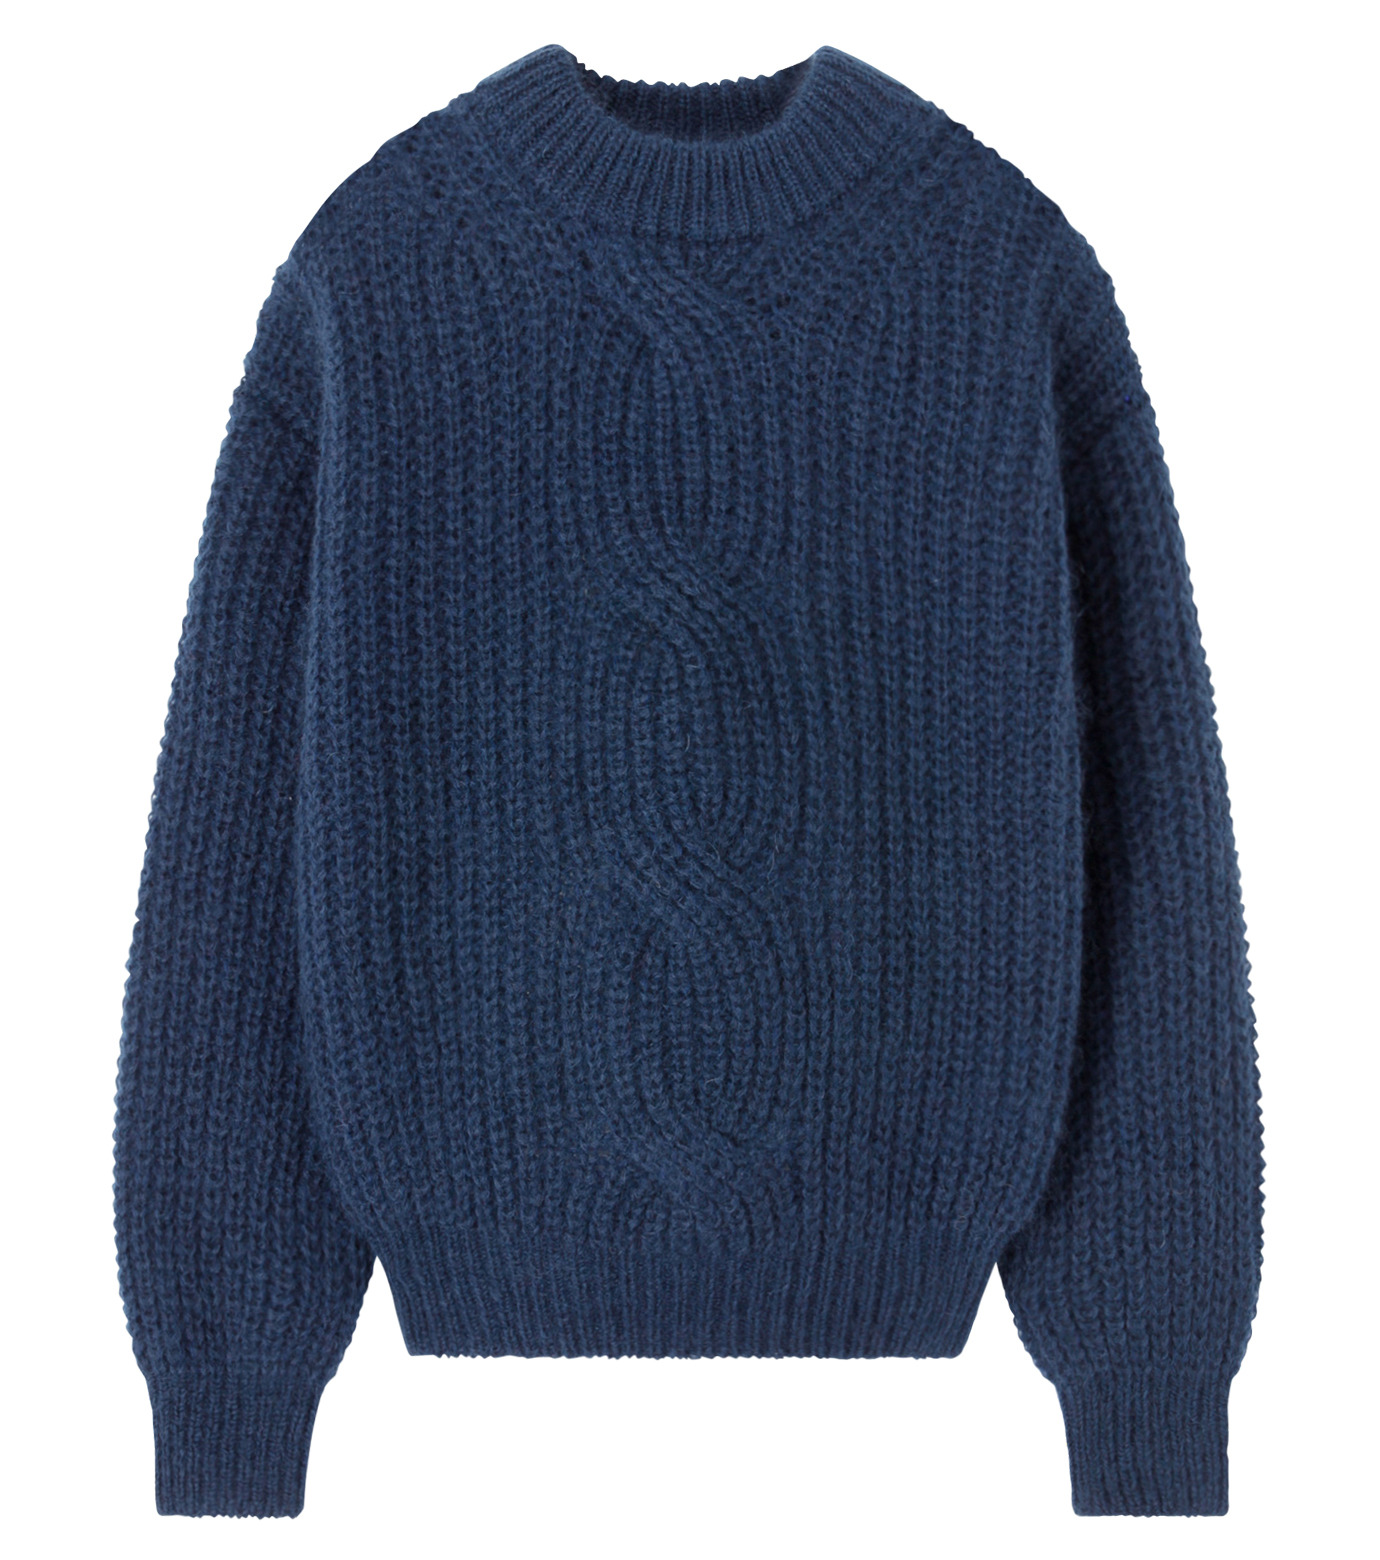 LE CIEL BLEU(ルシェルブルー)のケーブルニット-NAVY(ニット/トップス/knit/tops)-16A61051 拡大詳細画像1